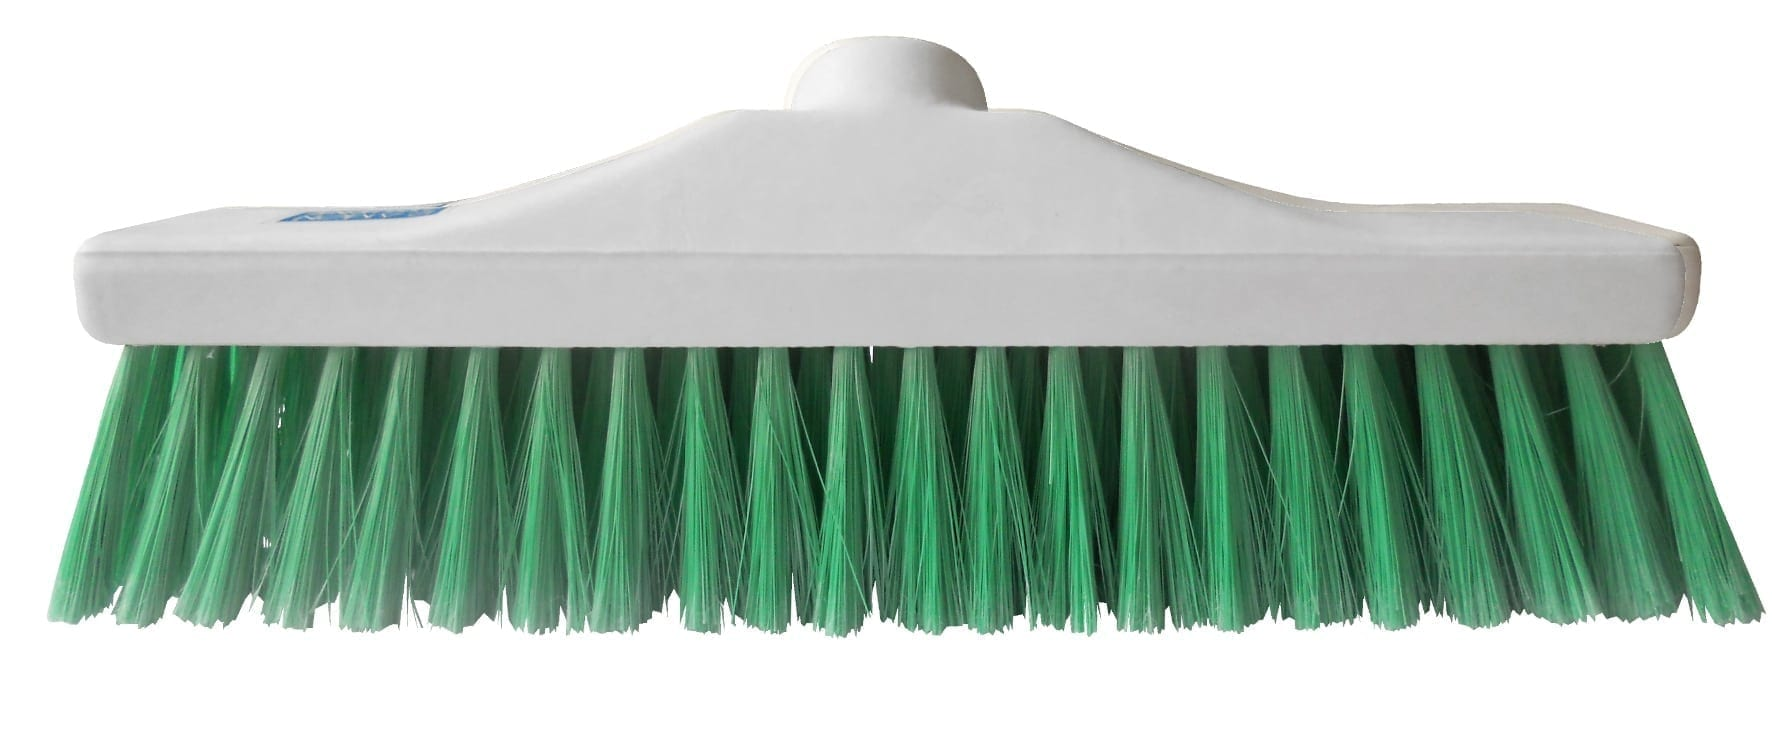 "Hygiene Brush Head 12"" - Stiff Bristle - Green"